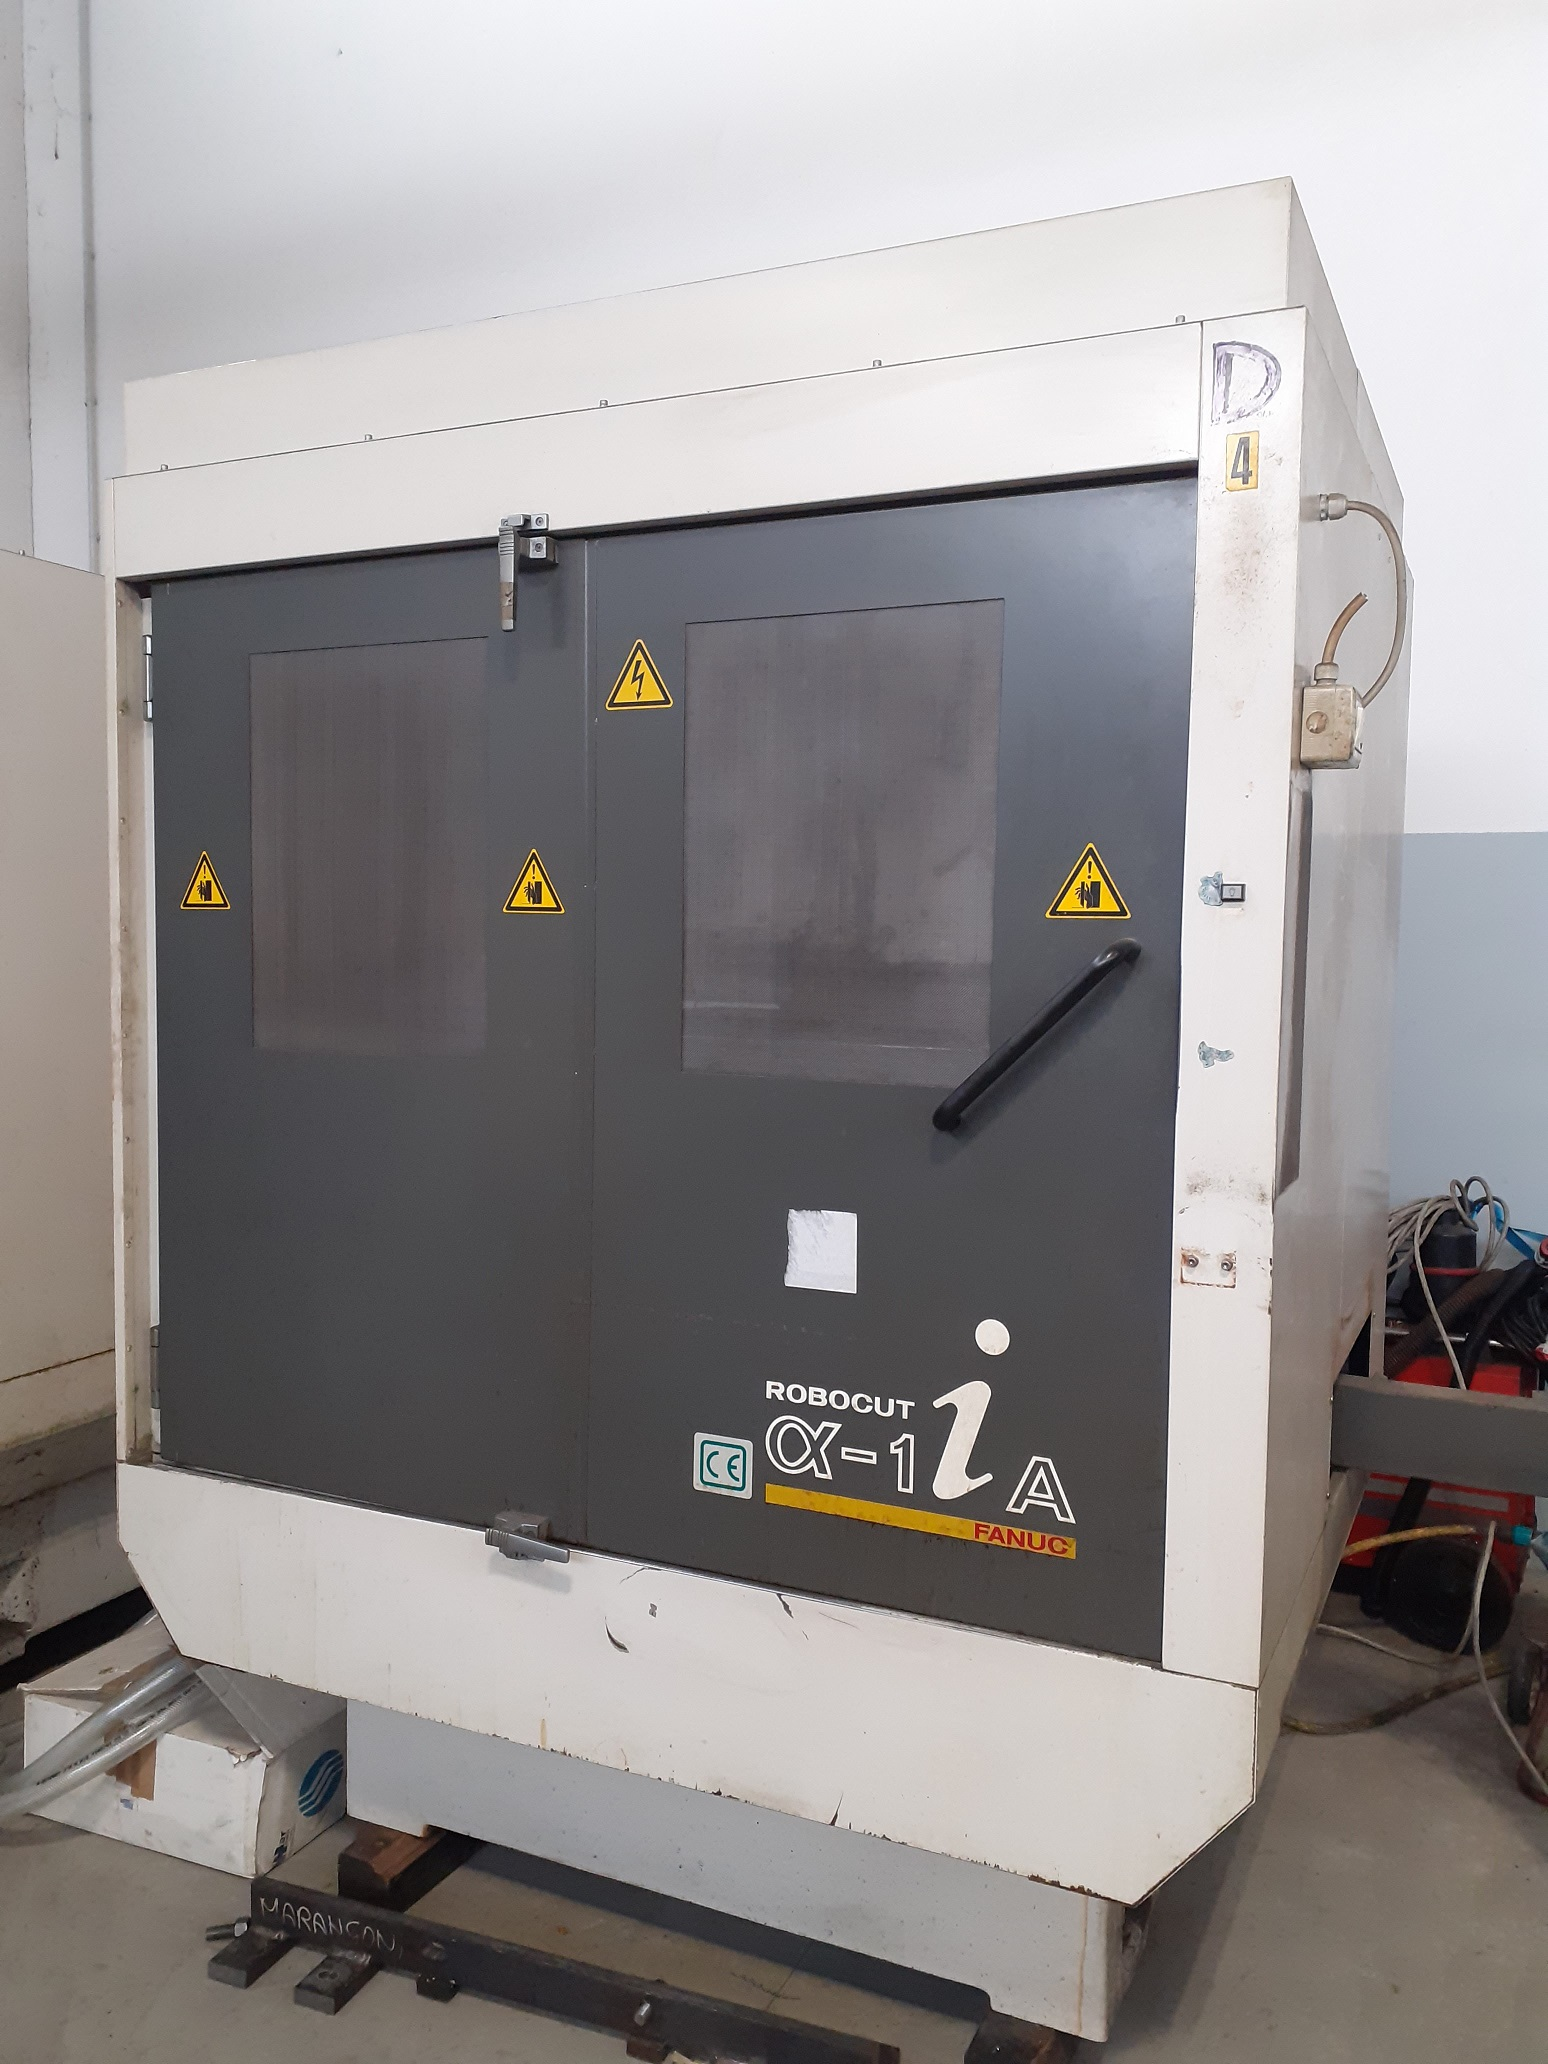 FANUC ROBOCUT α-1iA in vendita - foto 1